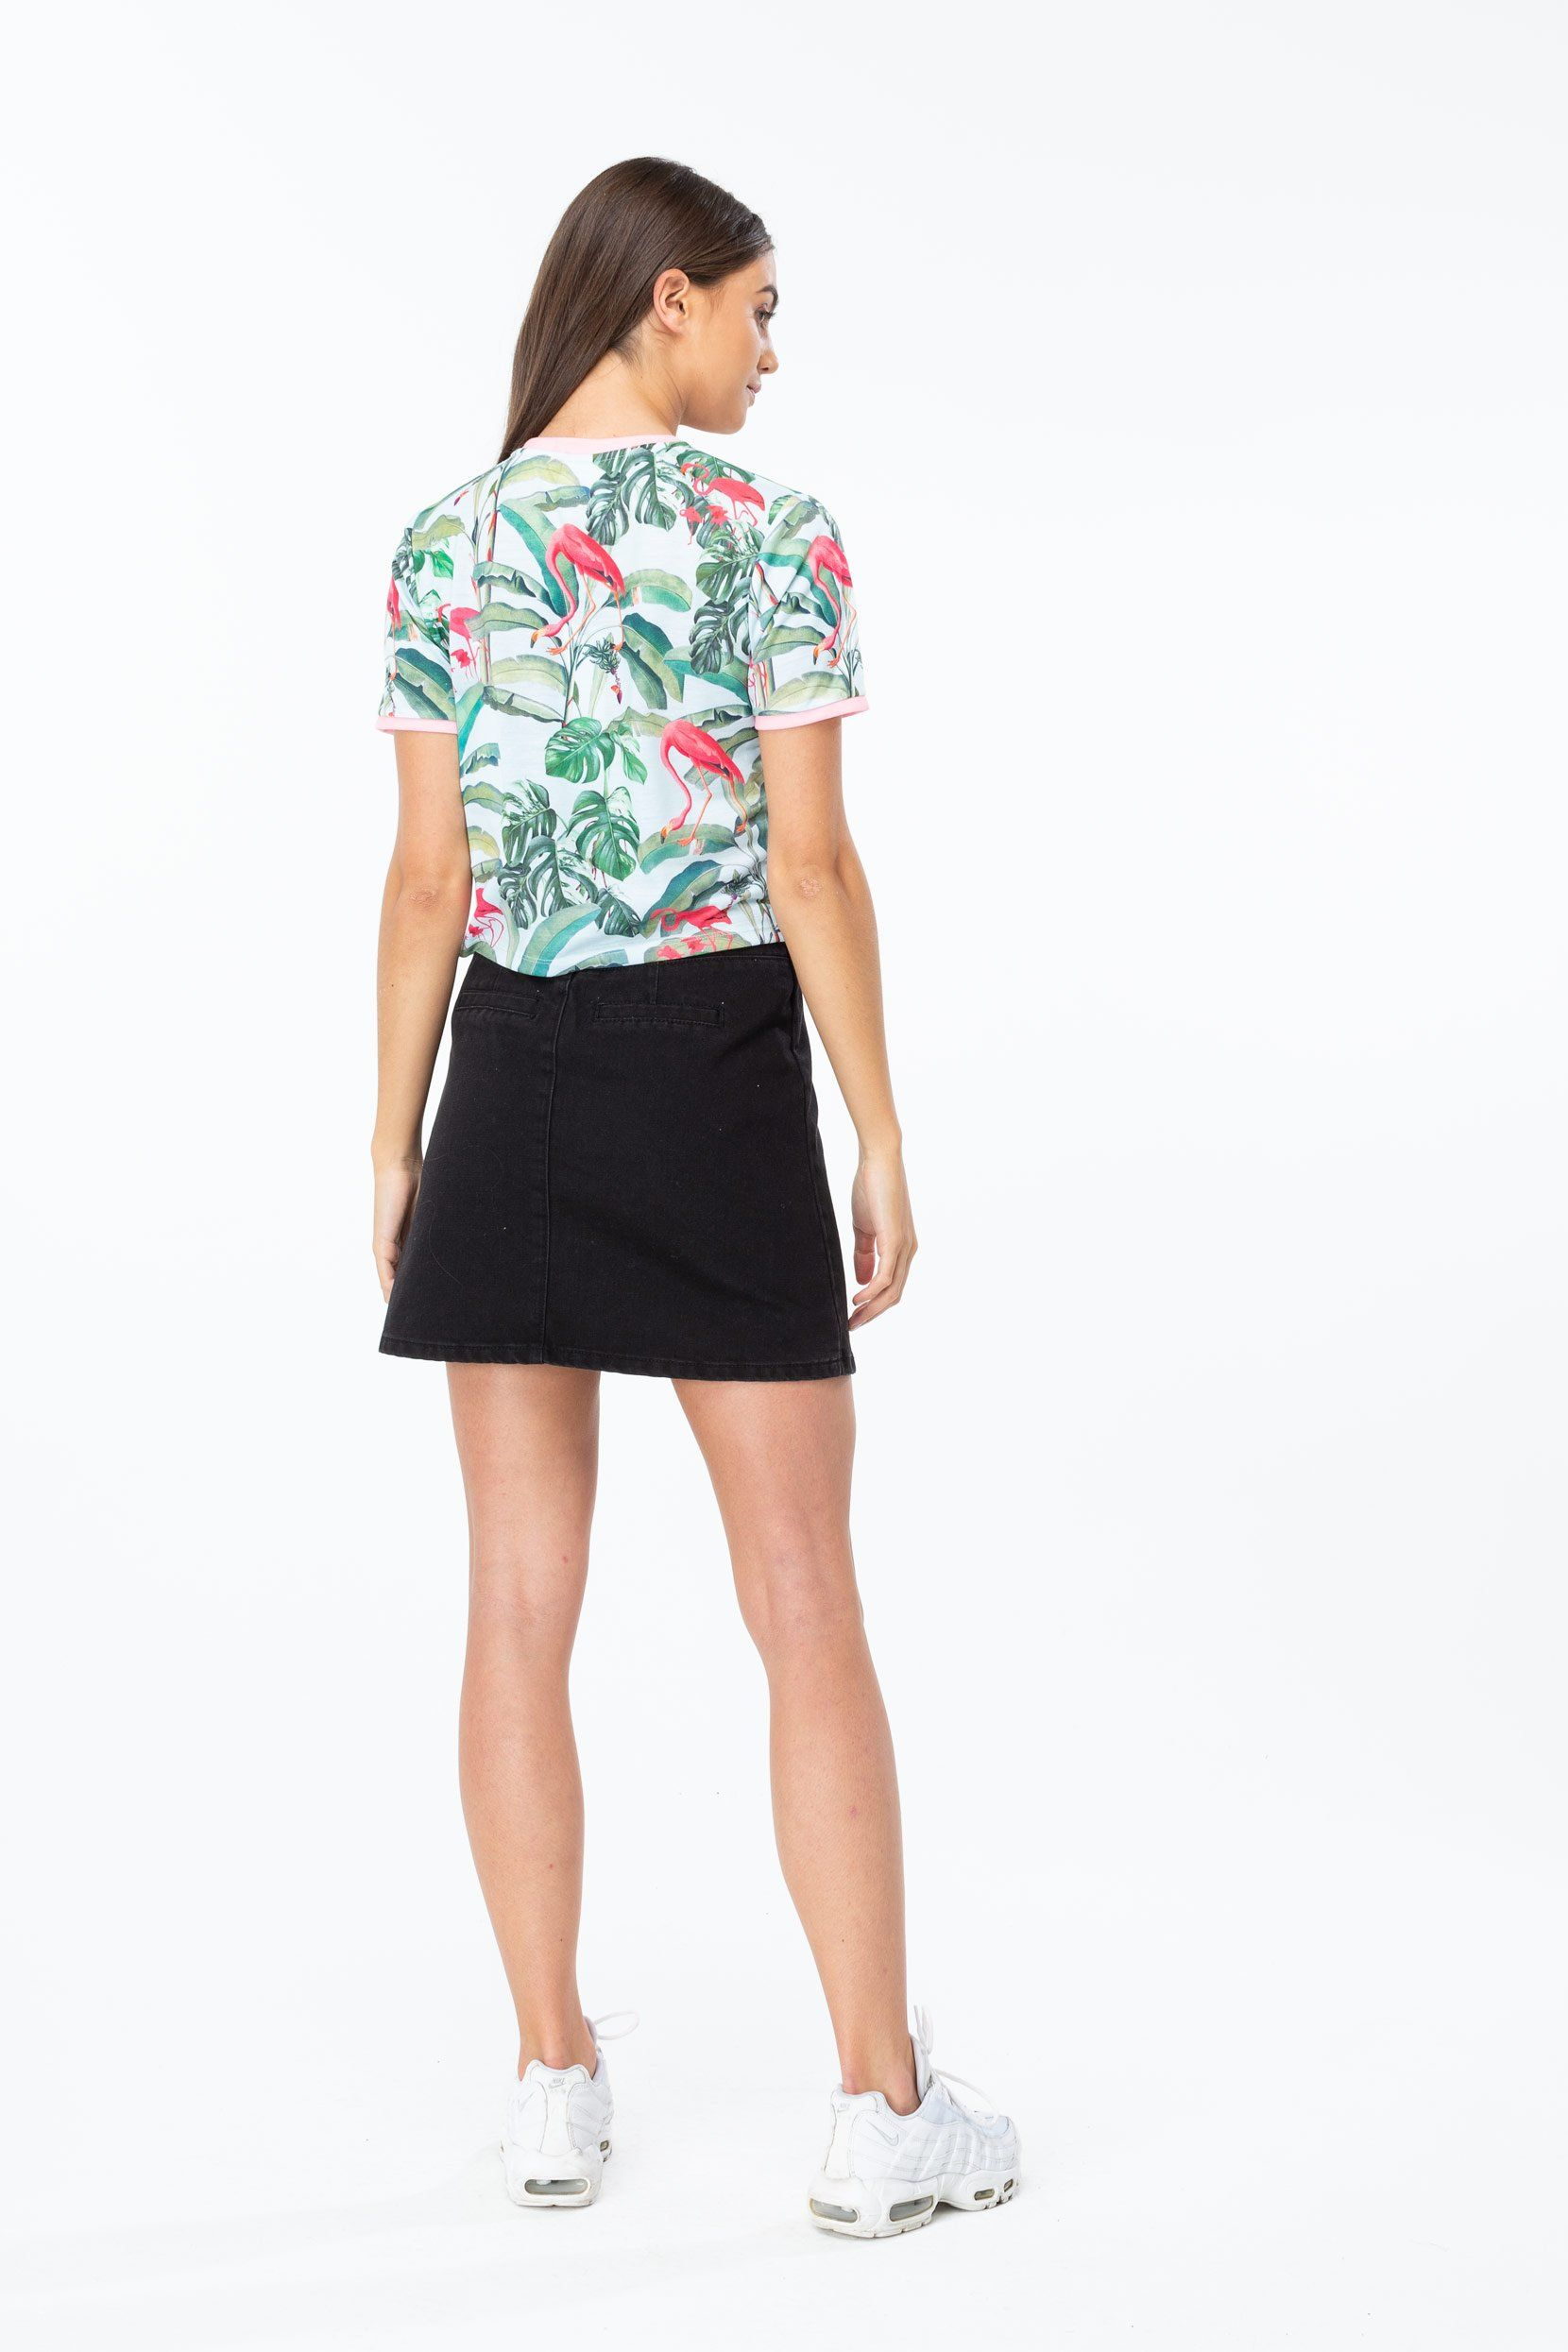 Hype Flamingo Paradise Womens Crop T-Shirt